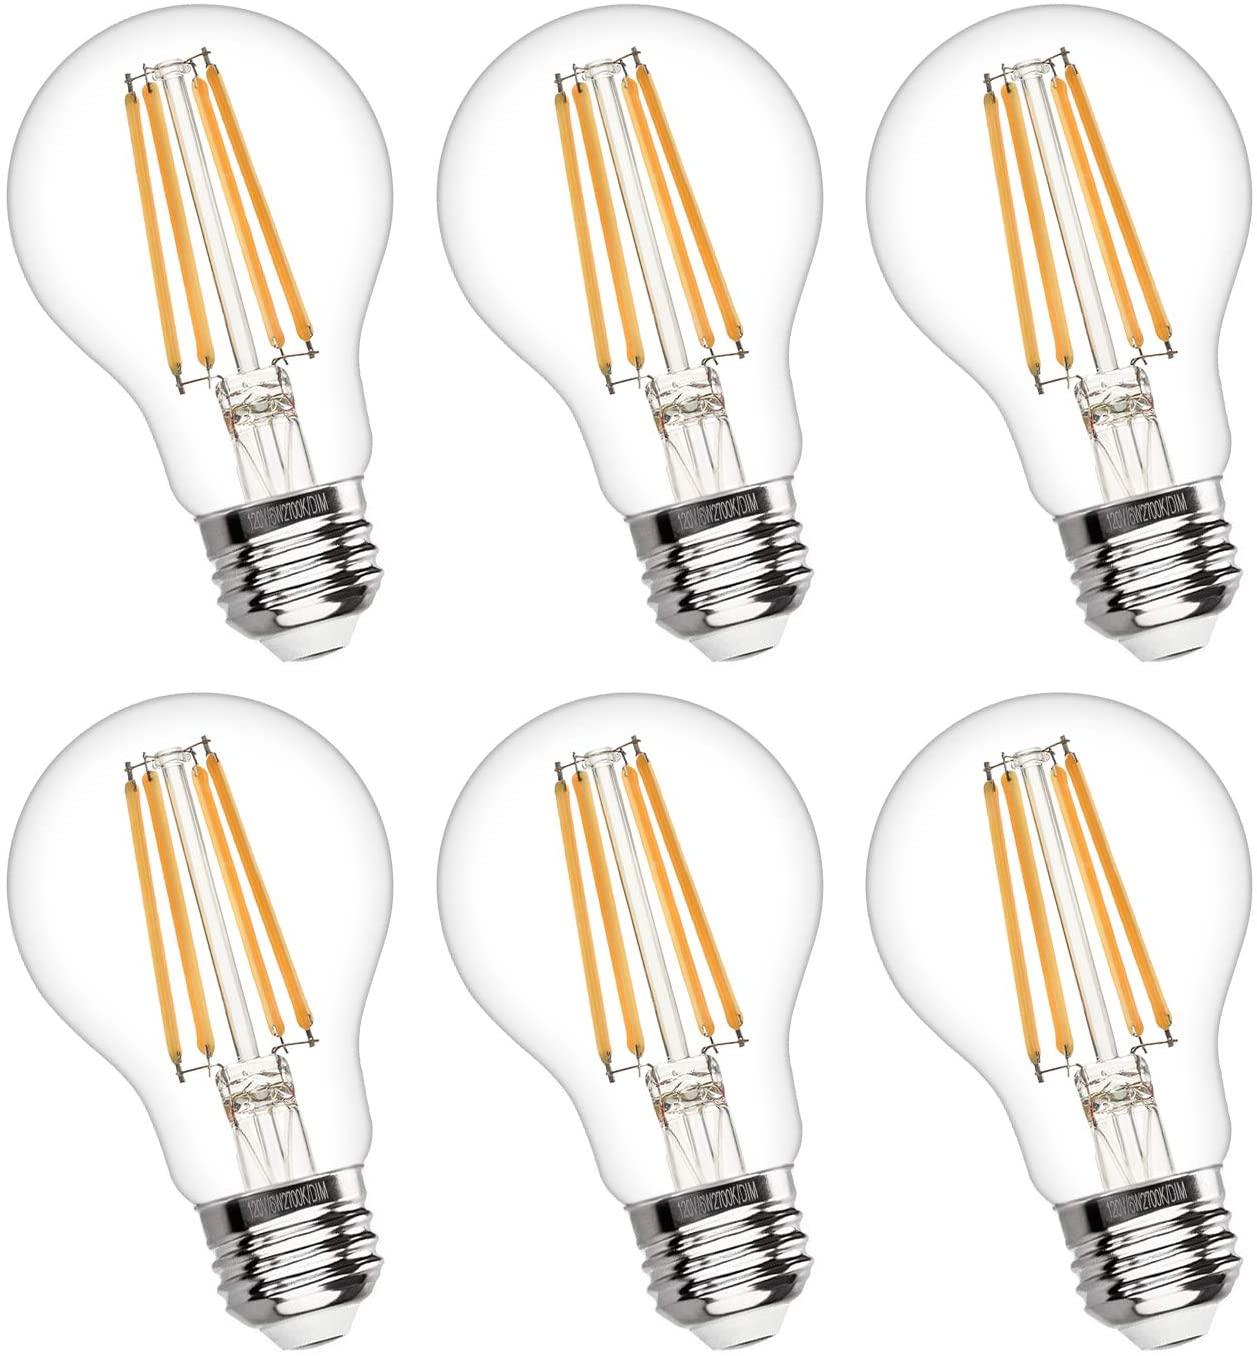 Boncoo Vintage LED Edison Bulb